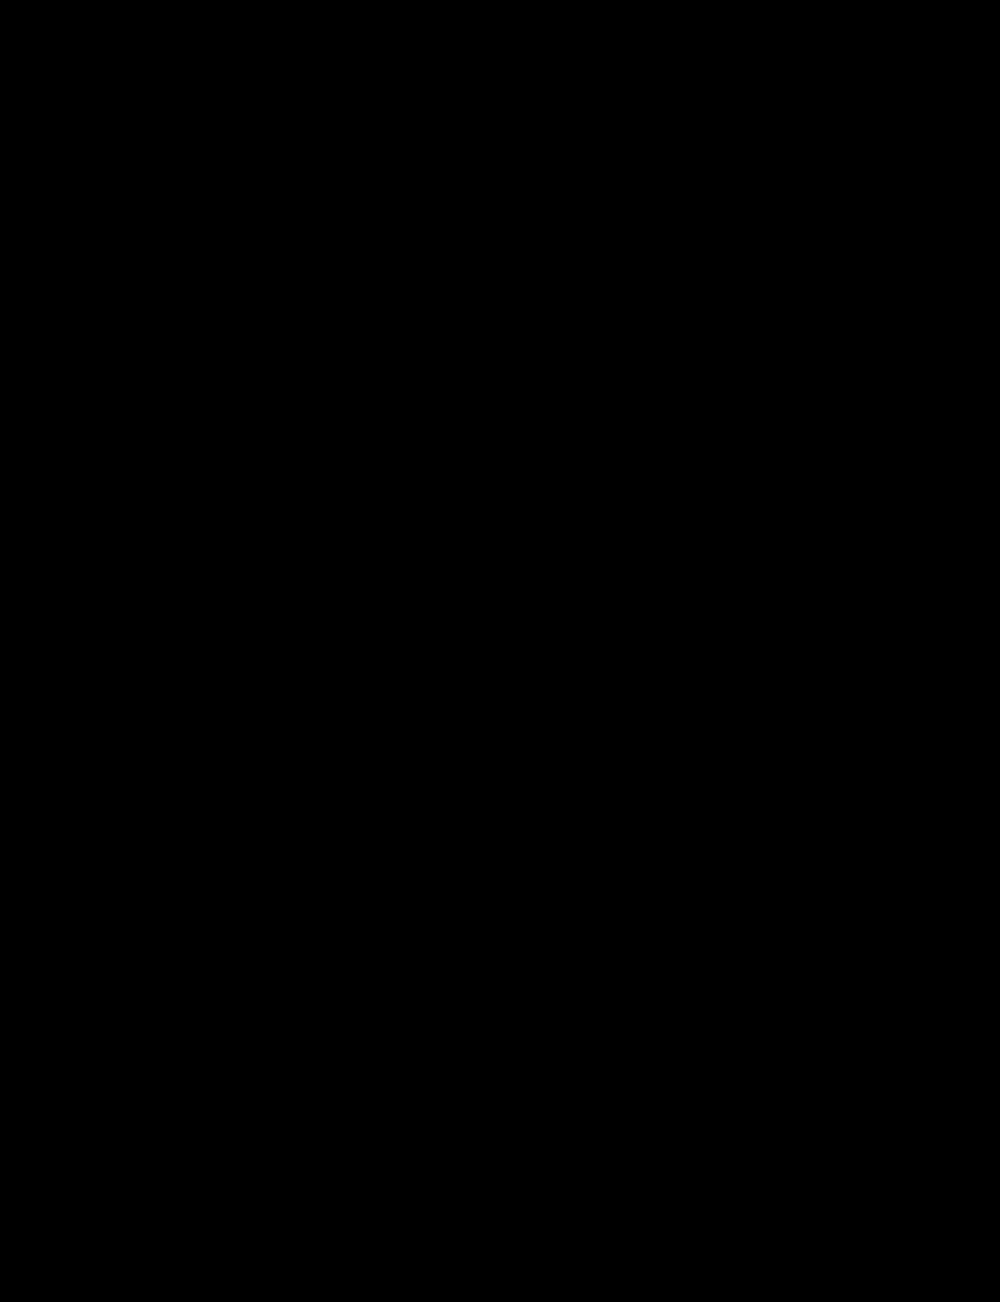 Frisure crŽêpue